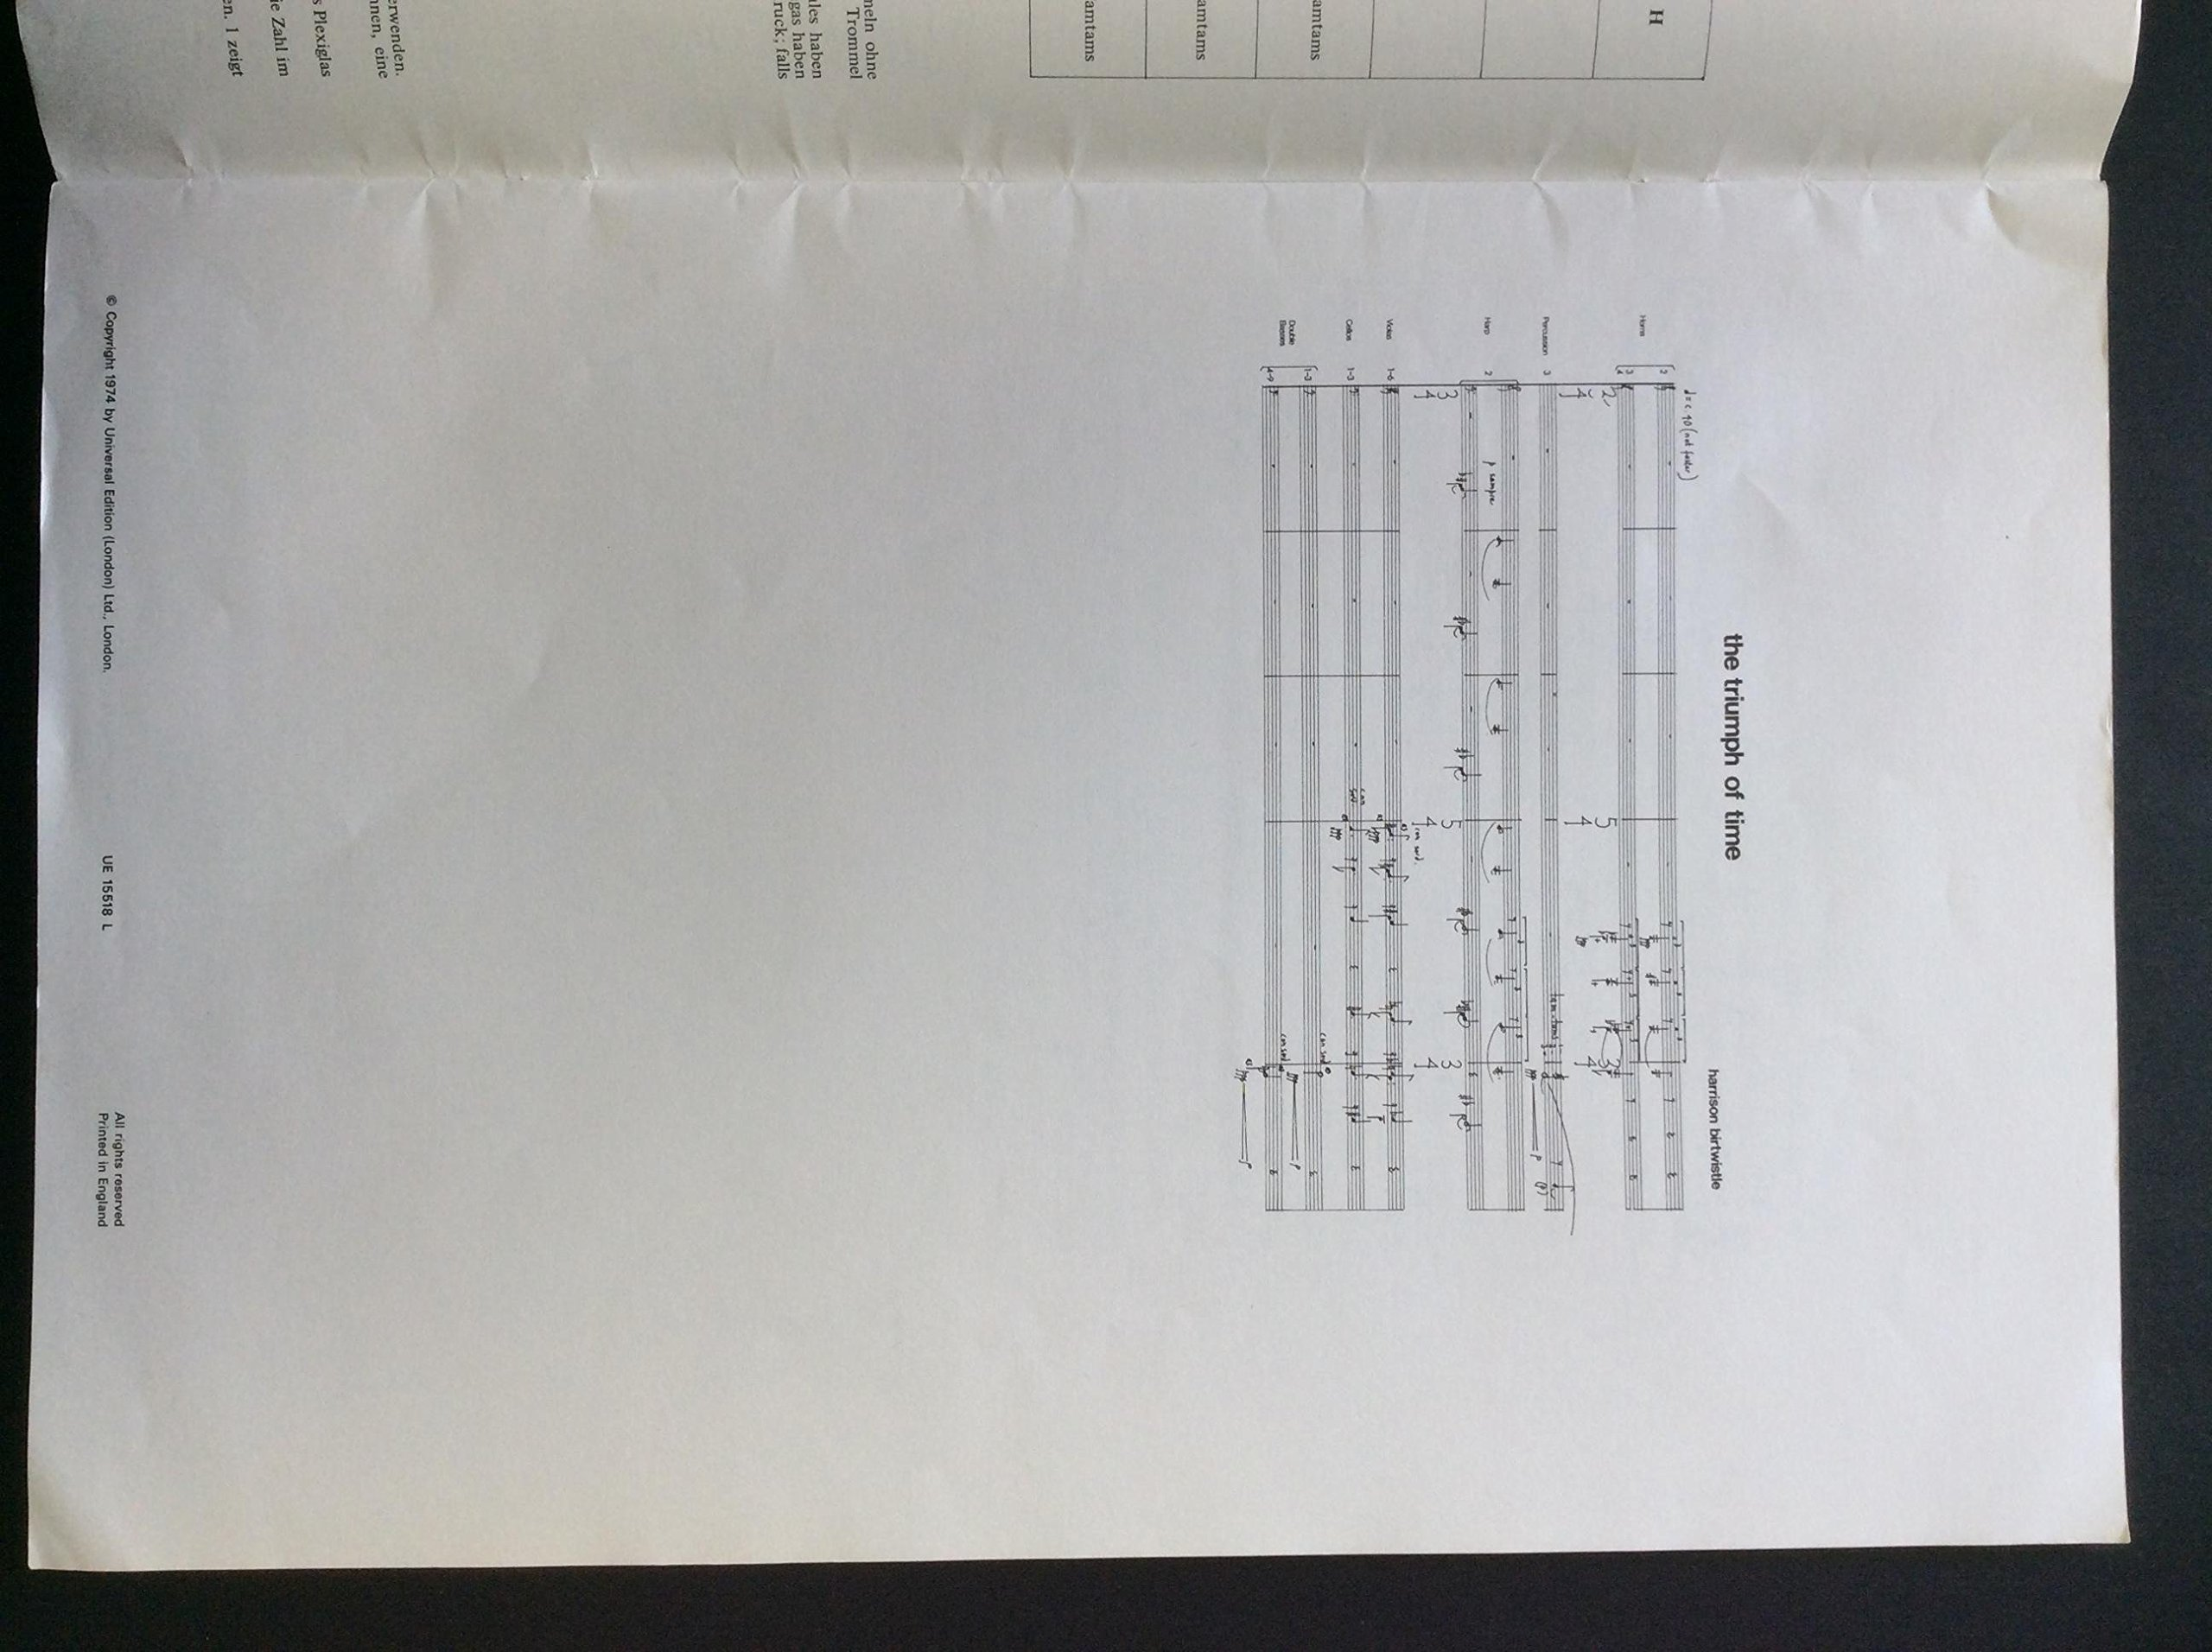 Birtwistle, Harrison. (b. 1934): The Triumph of Time Full Score